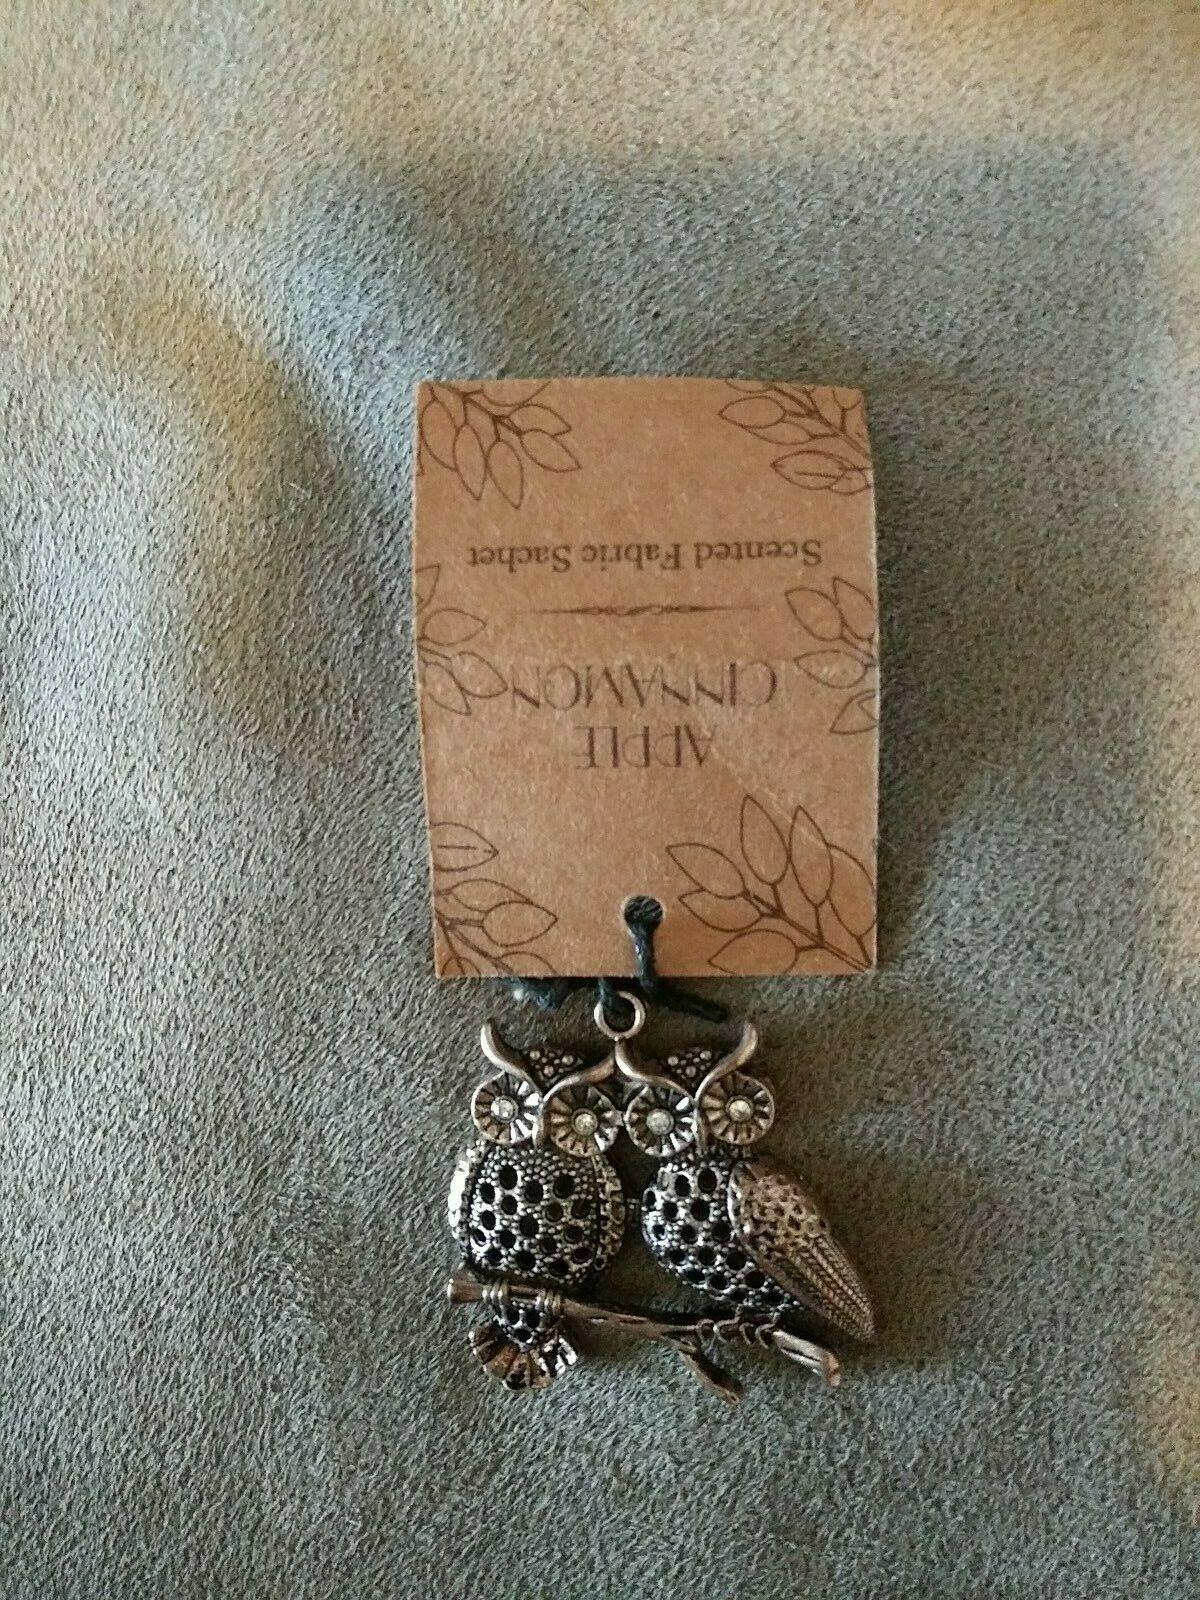 Owls apple cinnamon scented fabric sachet usefor necklace pendant Keychain charm